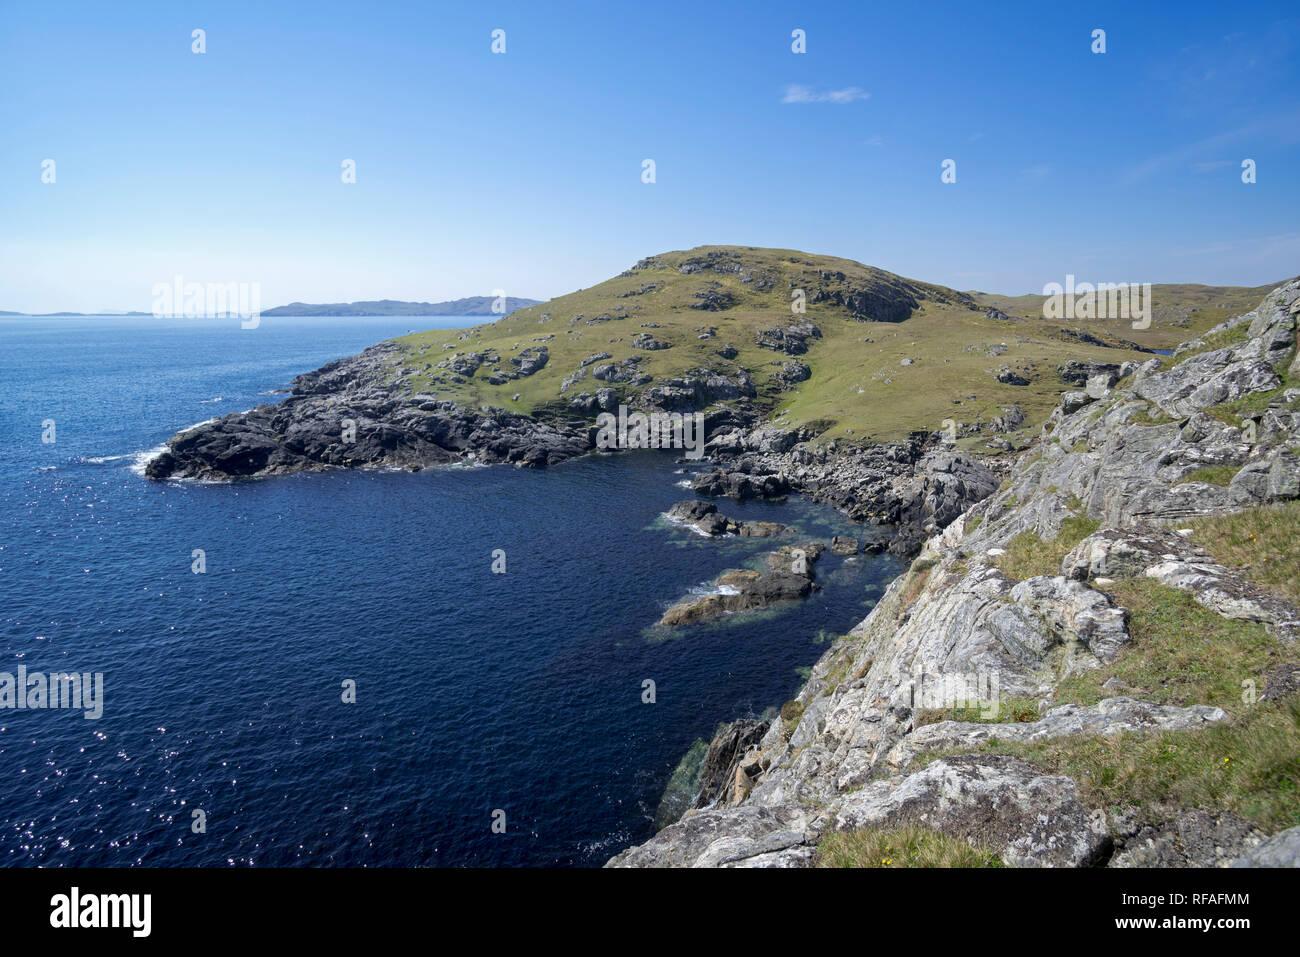 Rugged coastline at Lunna Ness, Mainland, Shetland Islands, Scotland, UK - Stock Image